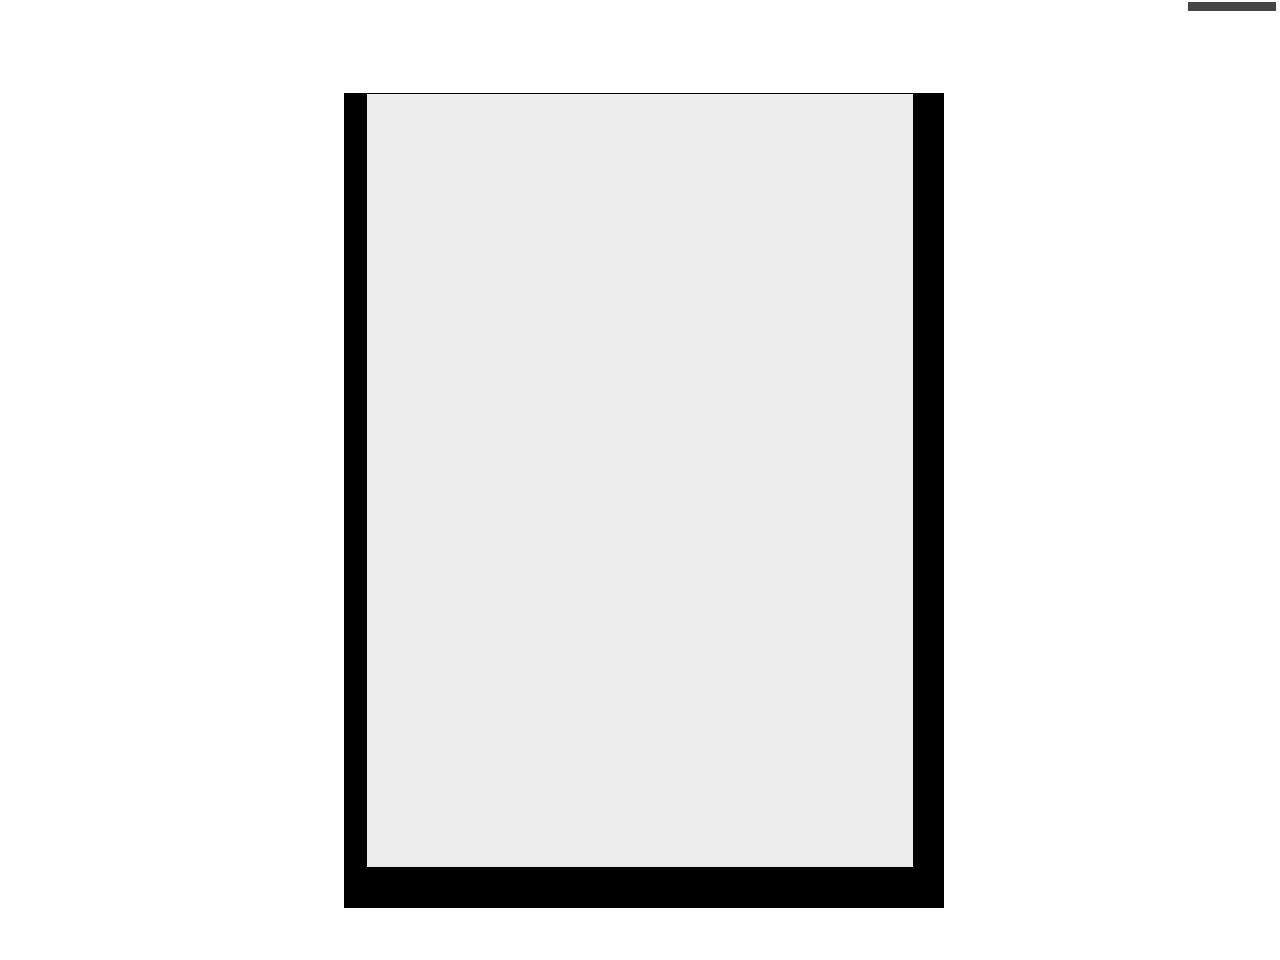 Blank white paper PSDGraphics 1280x960